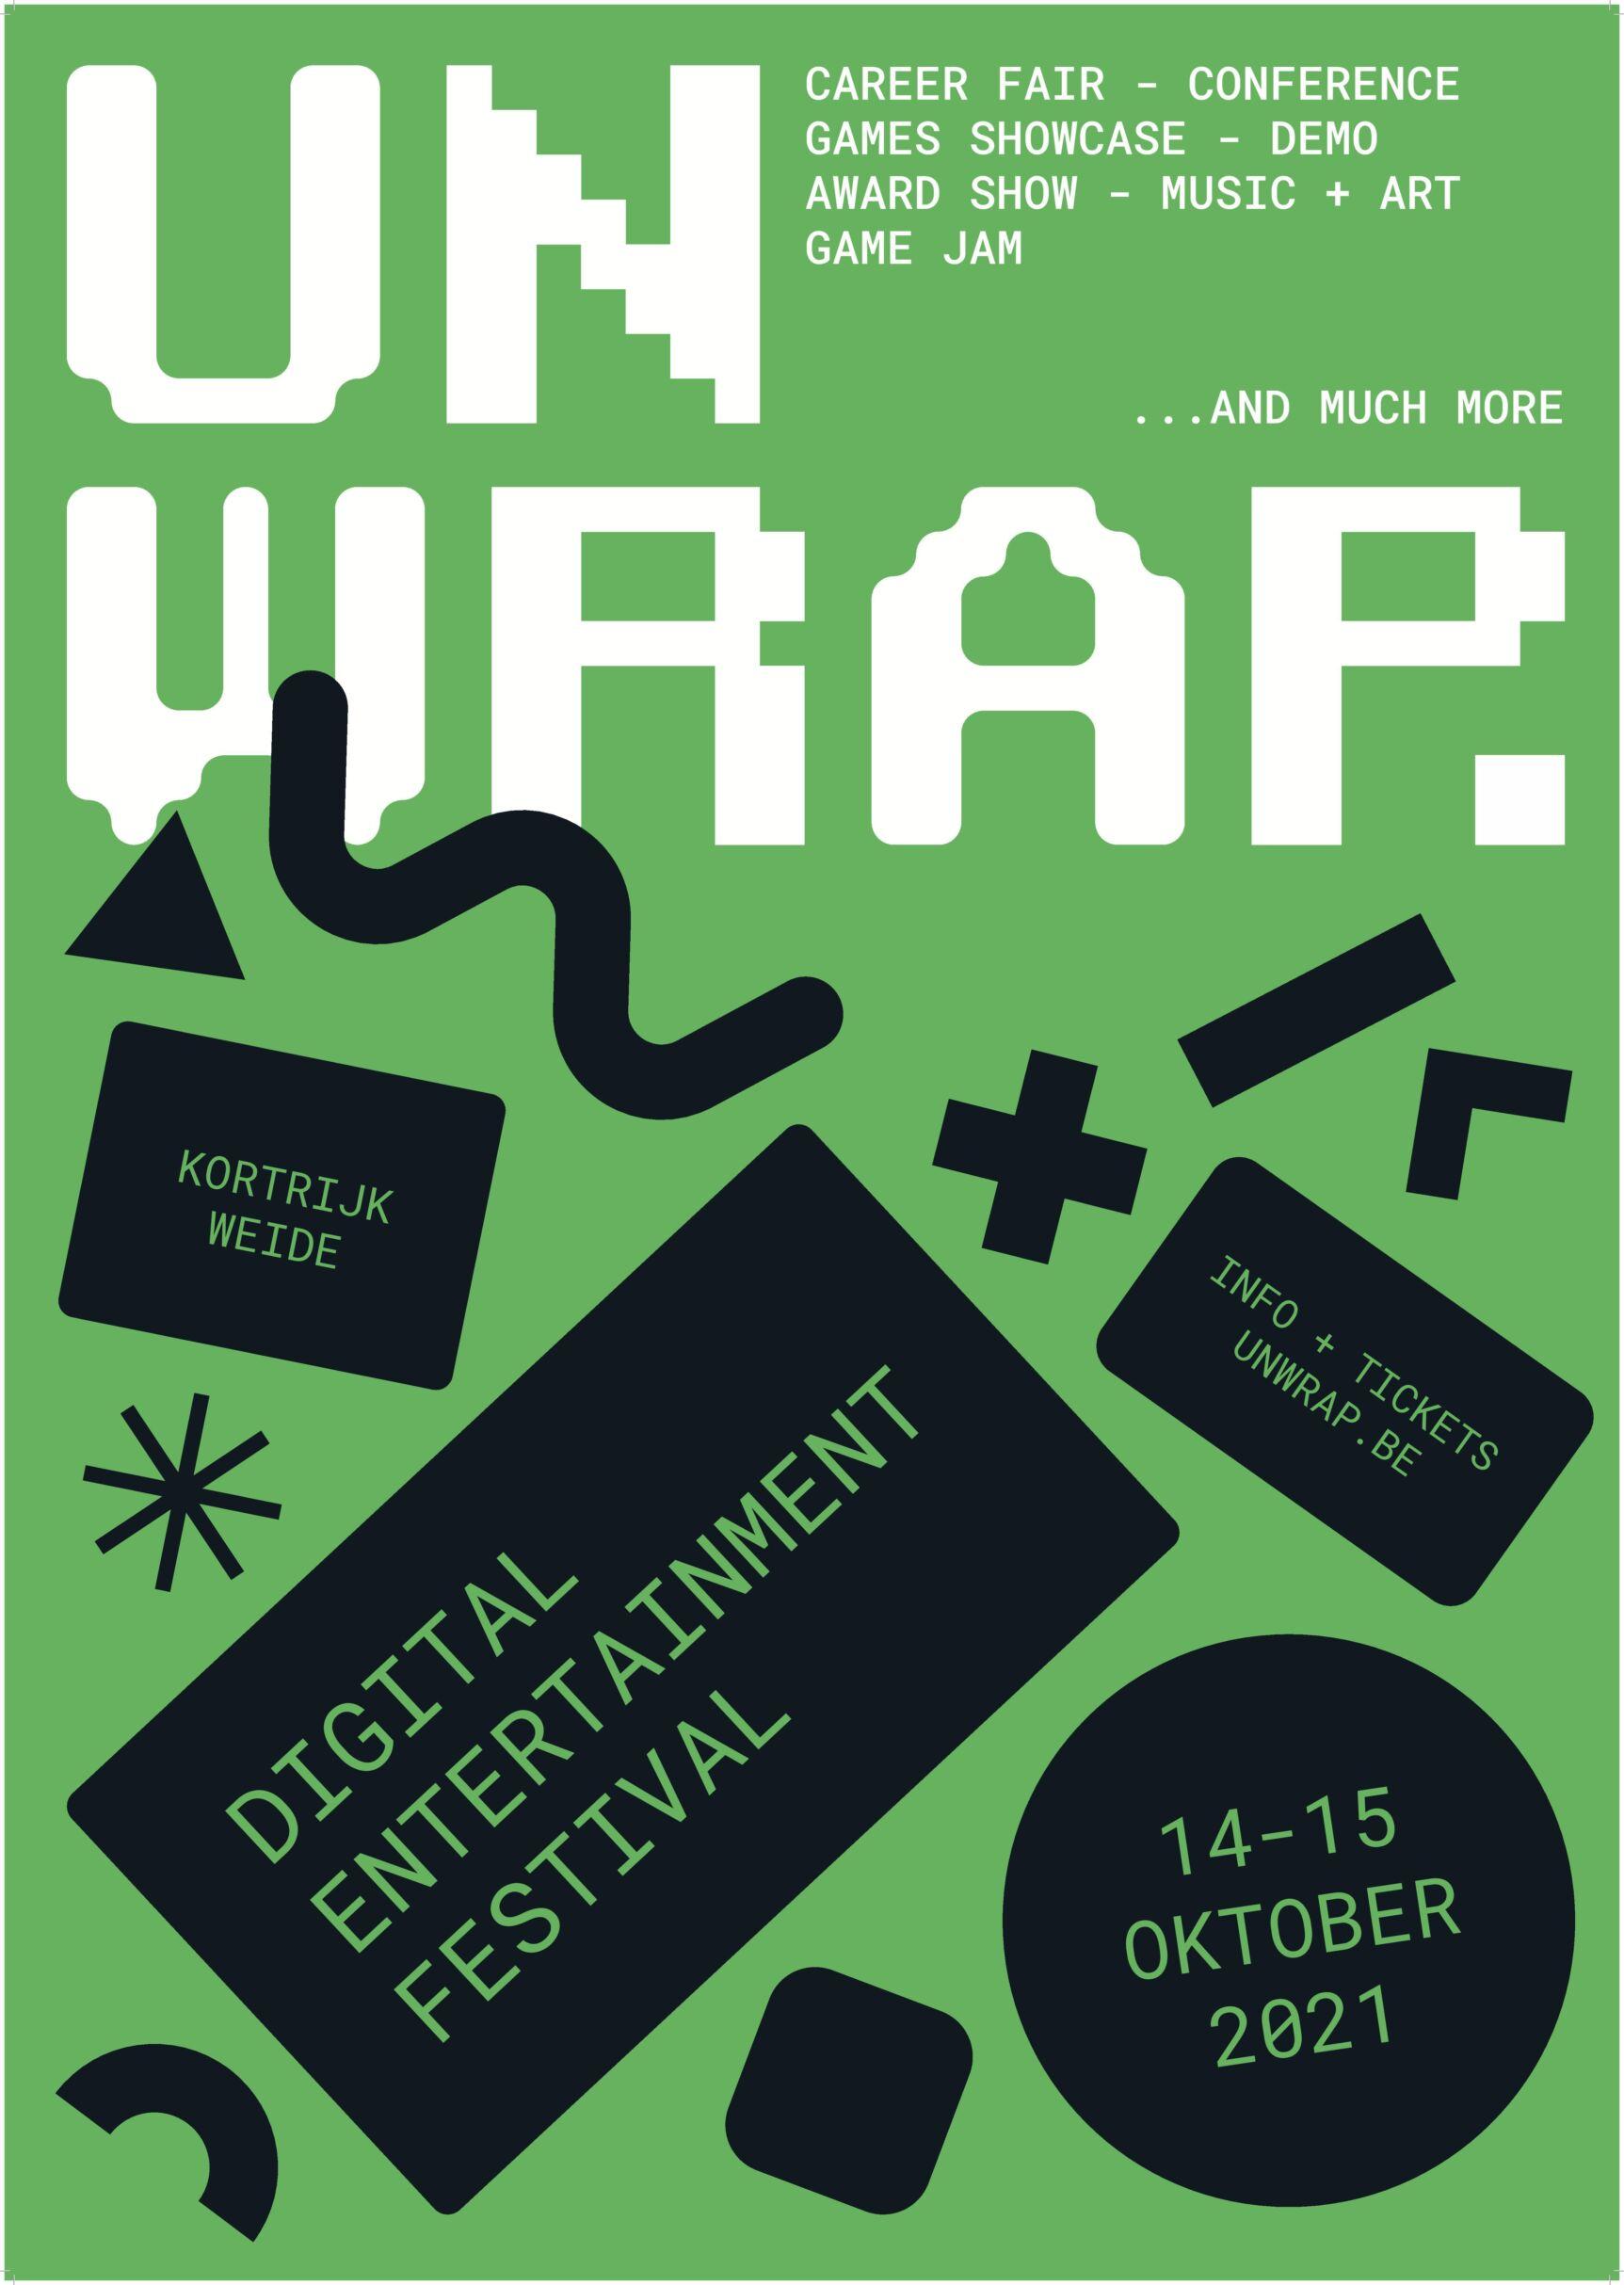 396221 Unwrap festival affiche 5567ac original 1626071908klein